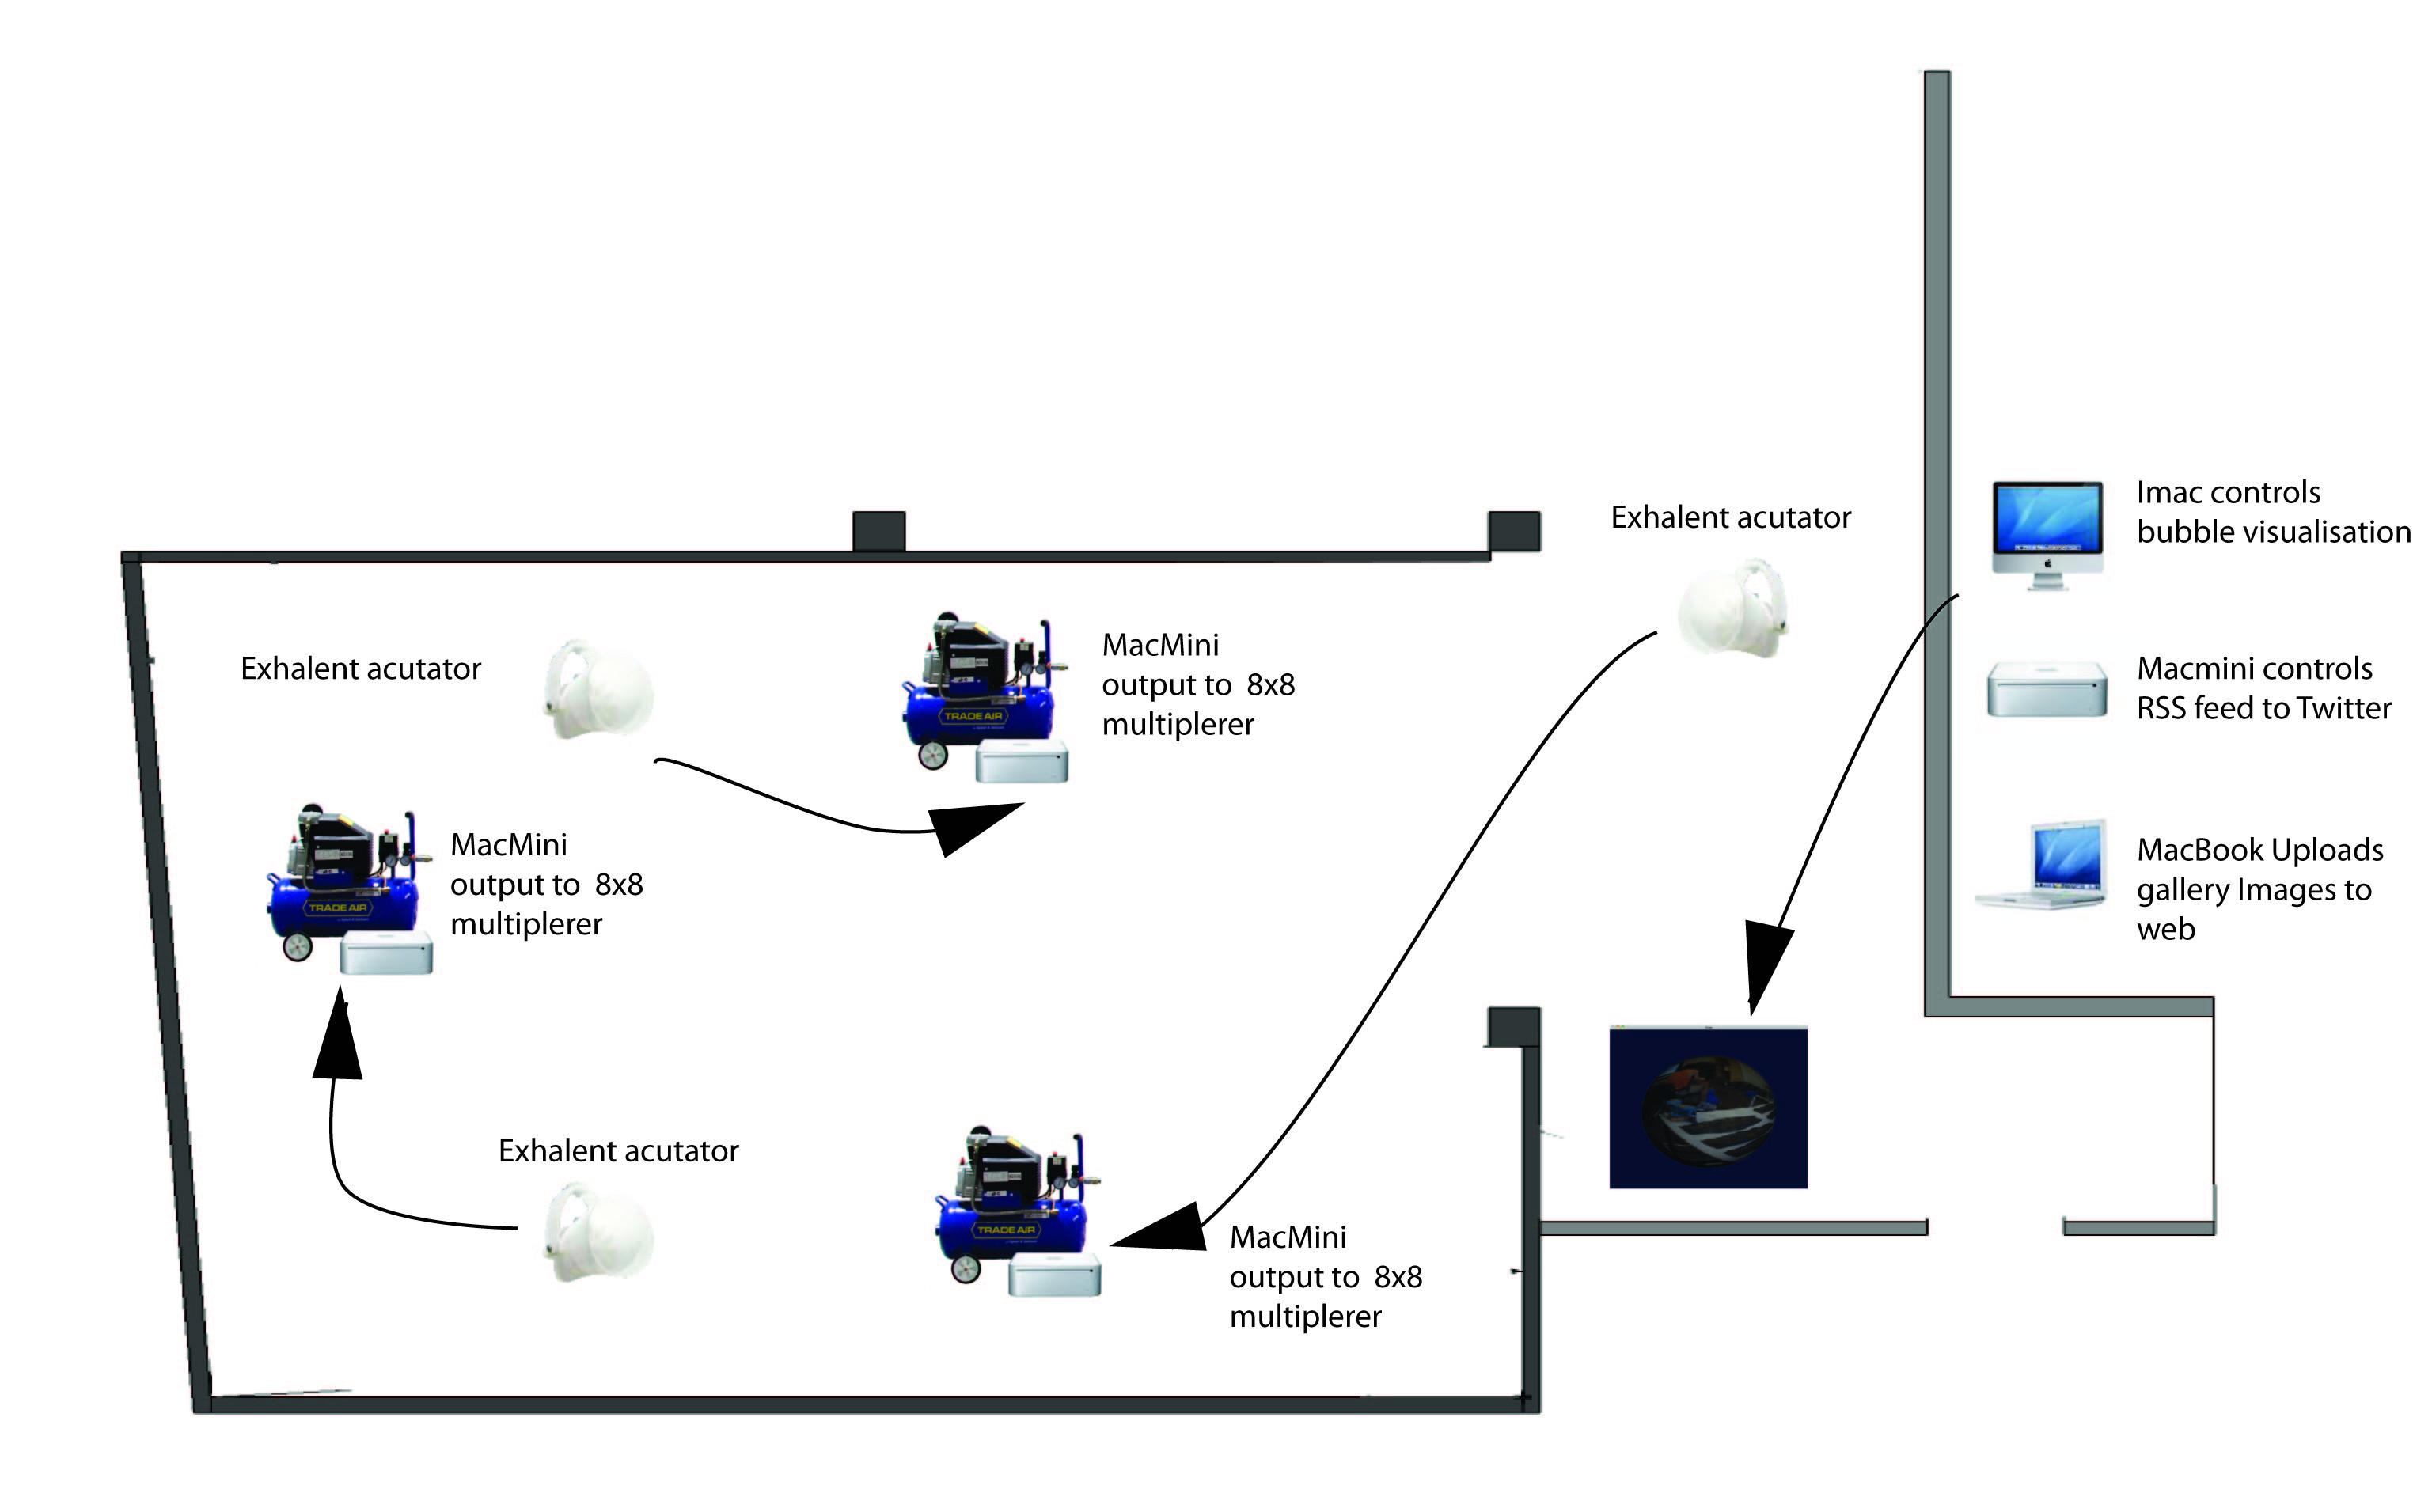 Network Diagram Icons